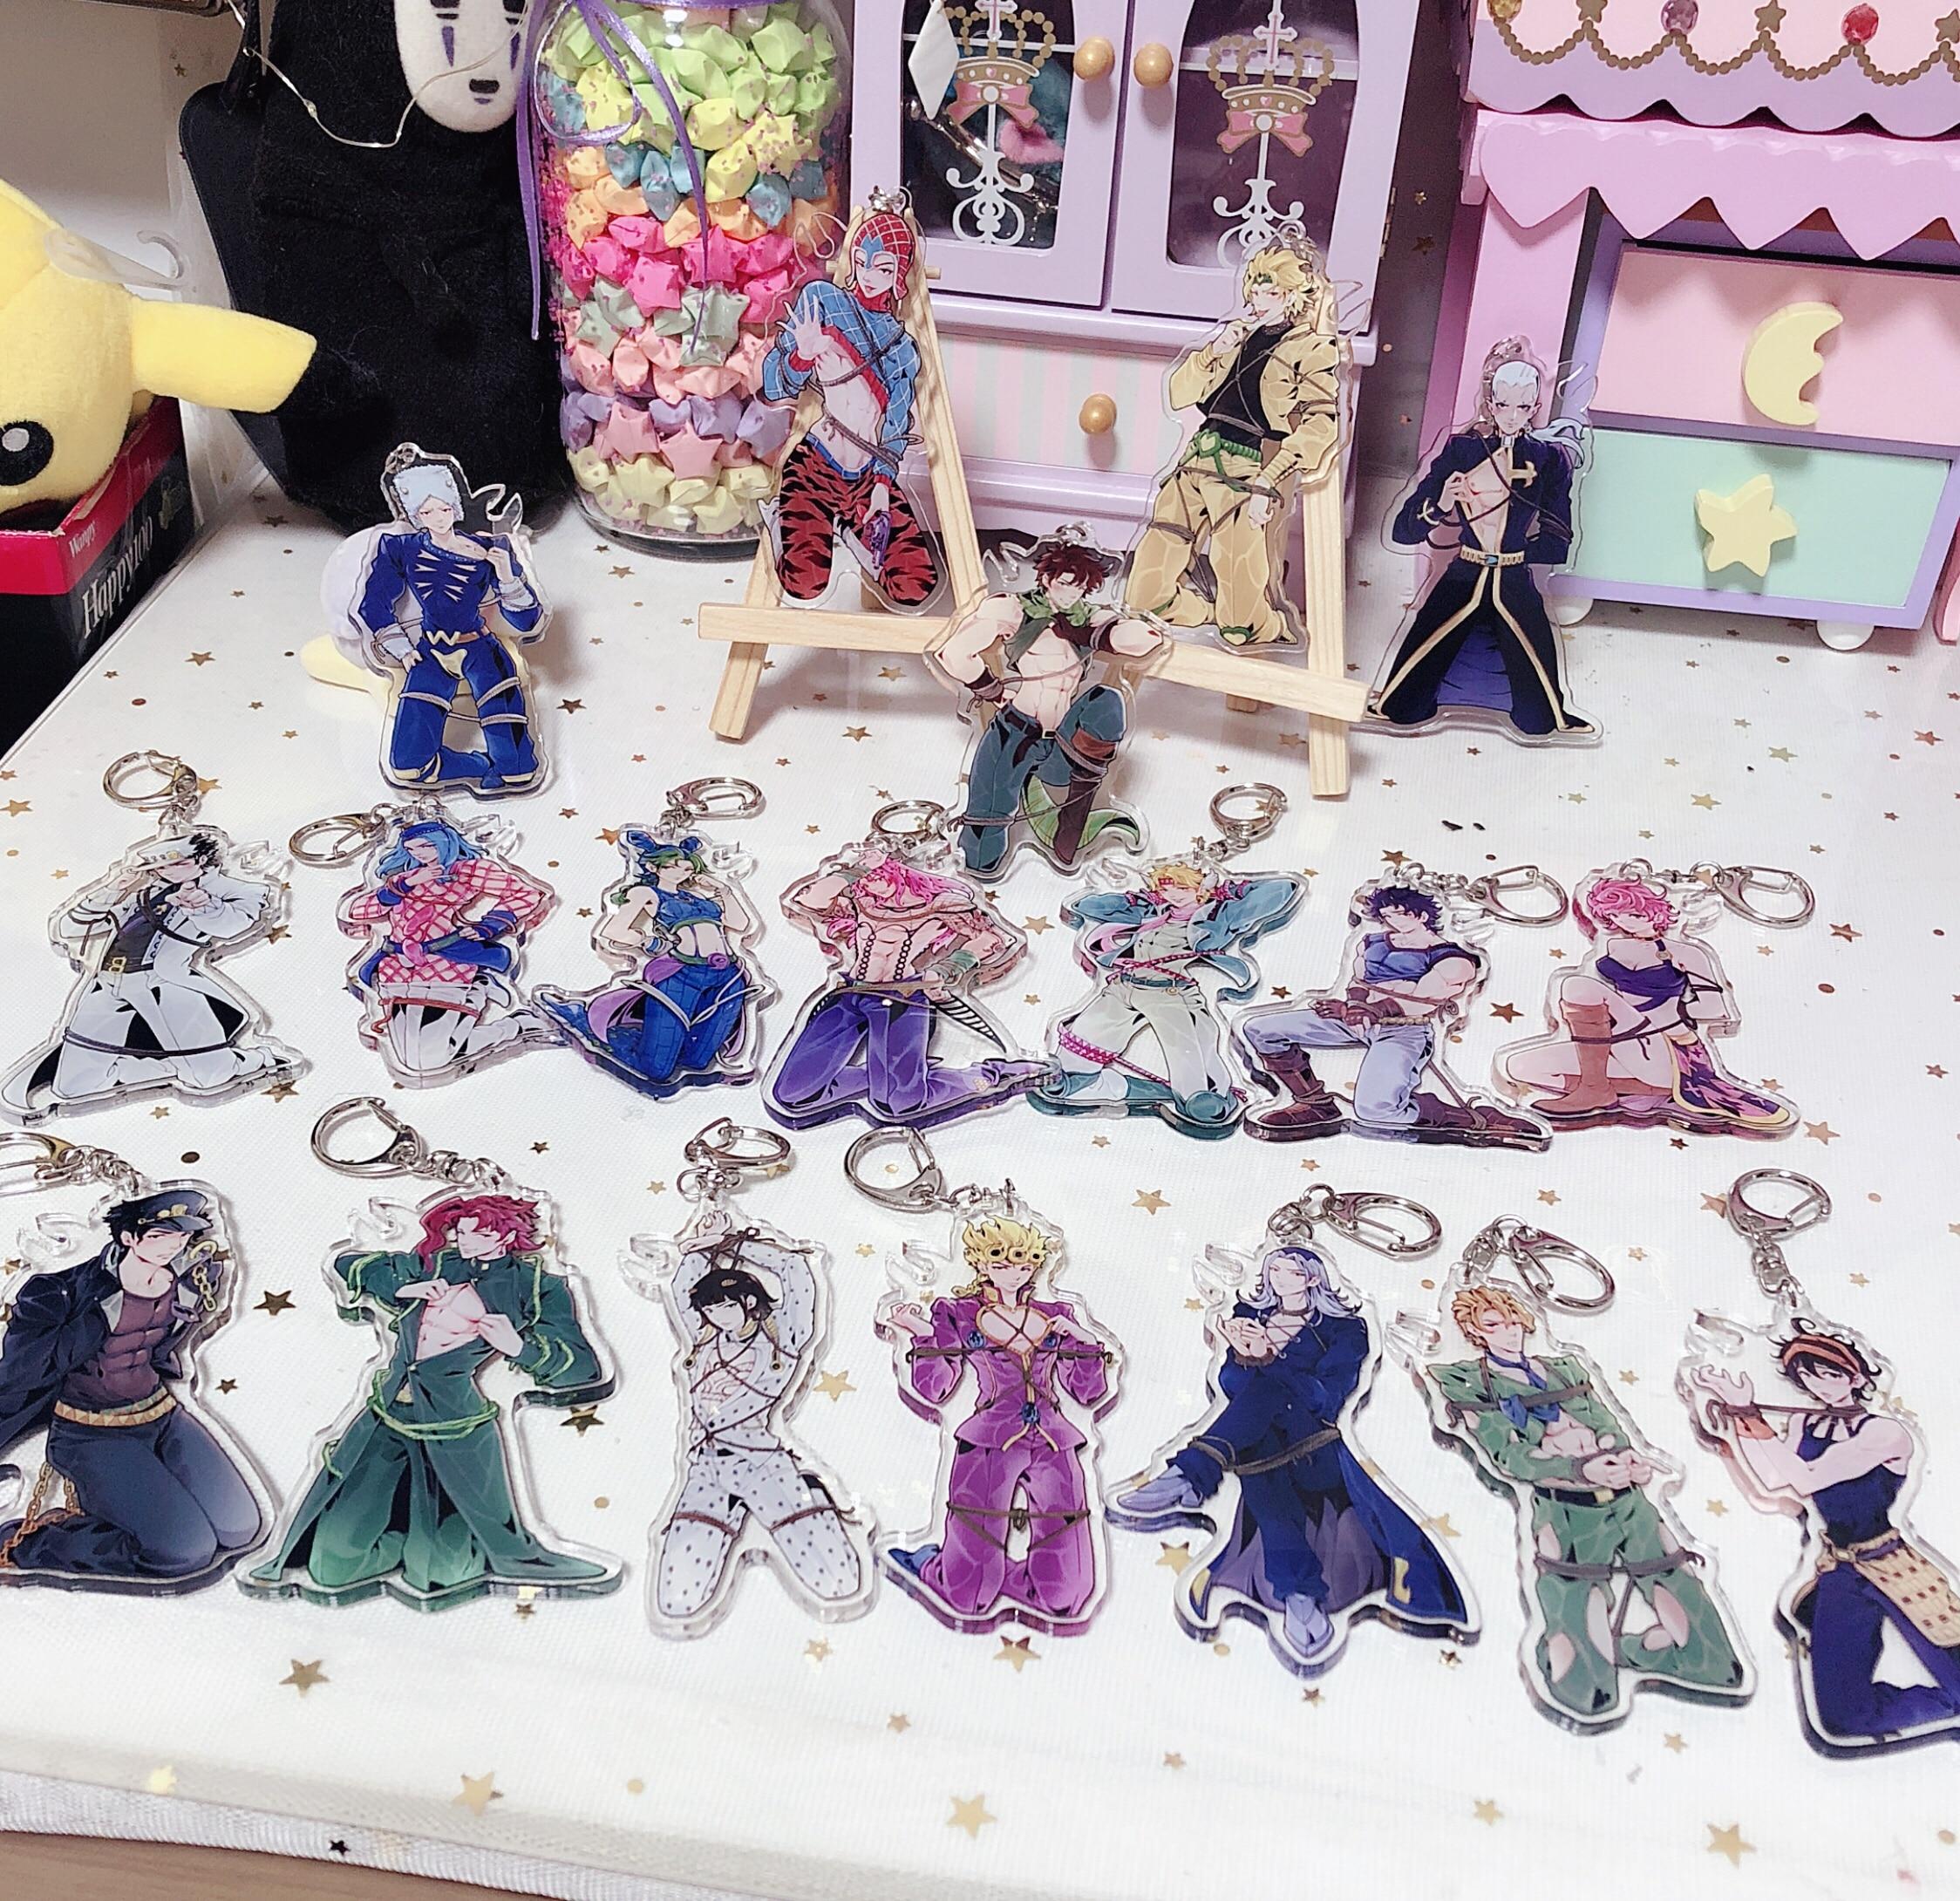 Anime JOJO's Bizarre Adventure Golden Wind Kujo Jotaro Giorno Kakyoin Cosplay Key Chain Pendant Cartoon Keyring Cute Gift 10cm